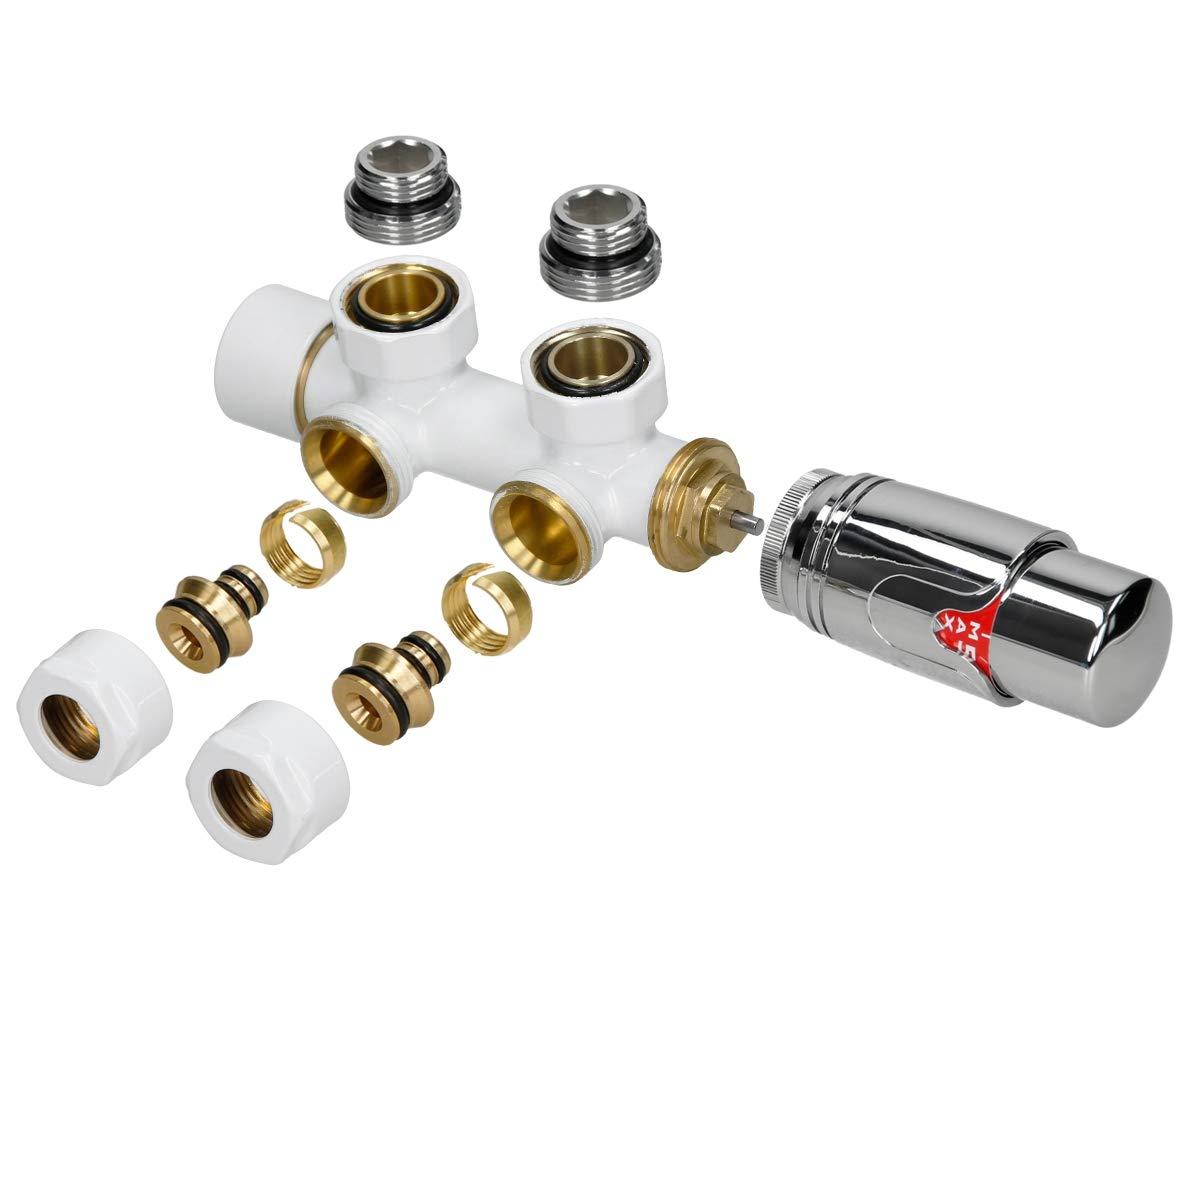 ECD Germany Wandanschlu/ß Anschlu/ßgarnitur Thermostat 50 mm Wei/ß Mittelanschluss Thermostatkopf Ventilhahnblock Ventil f/ür Heizk/örper